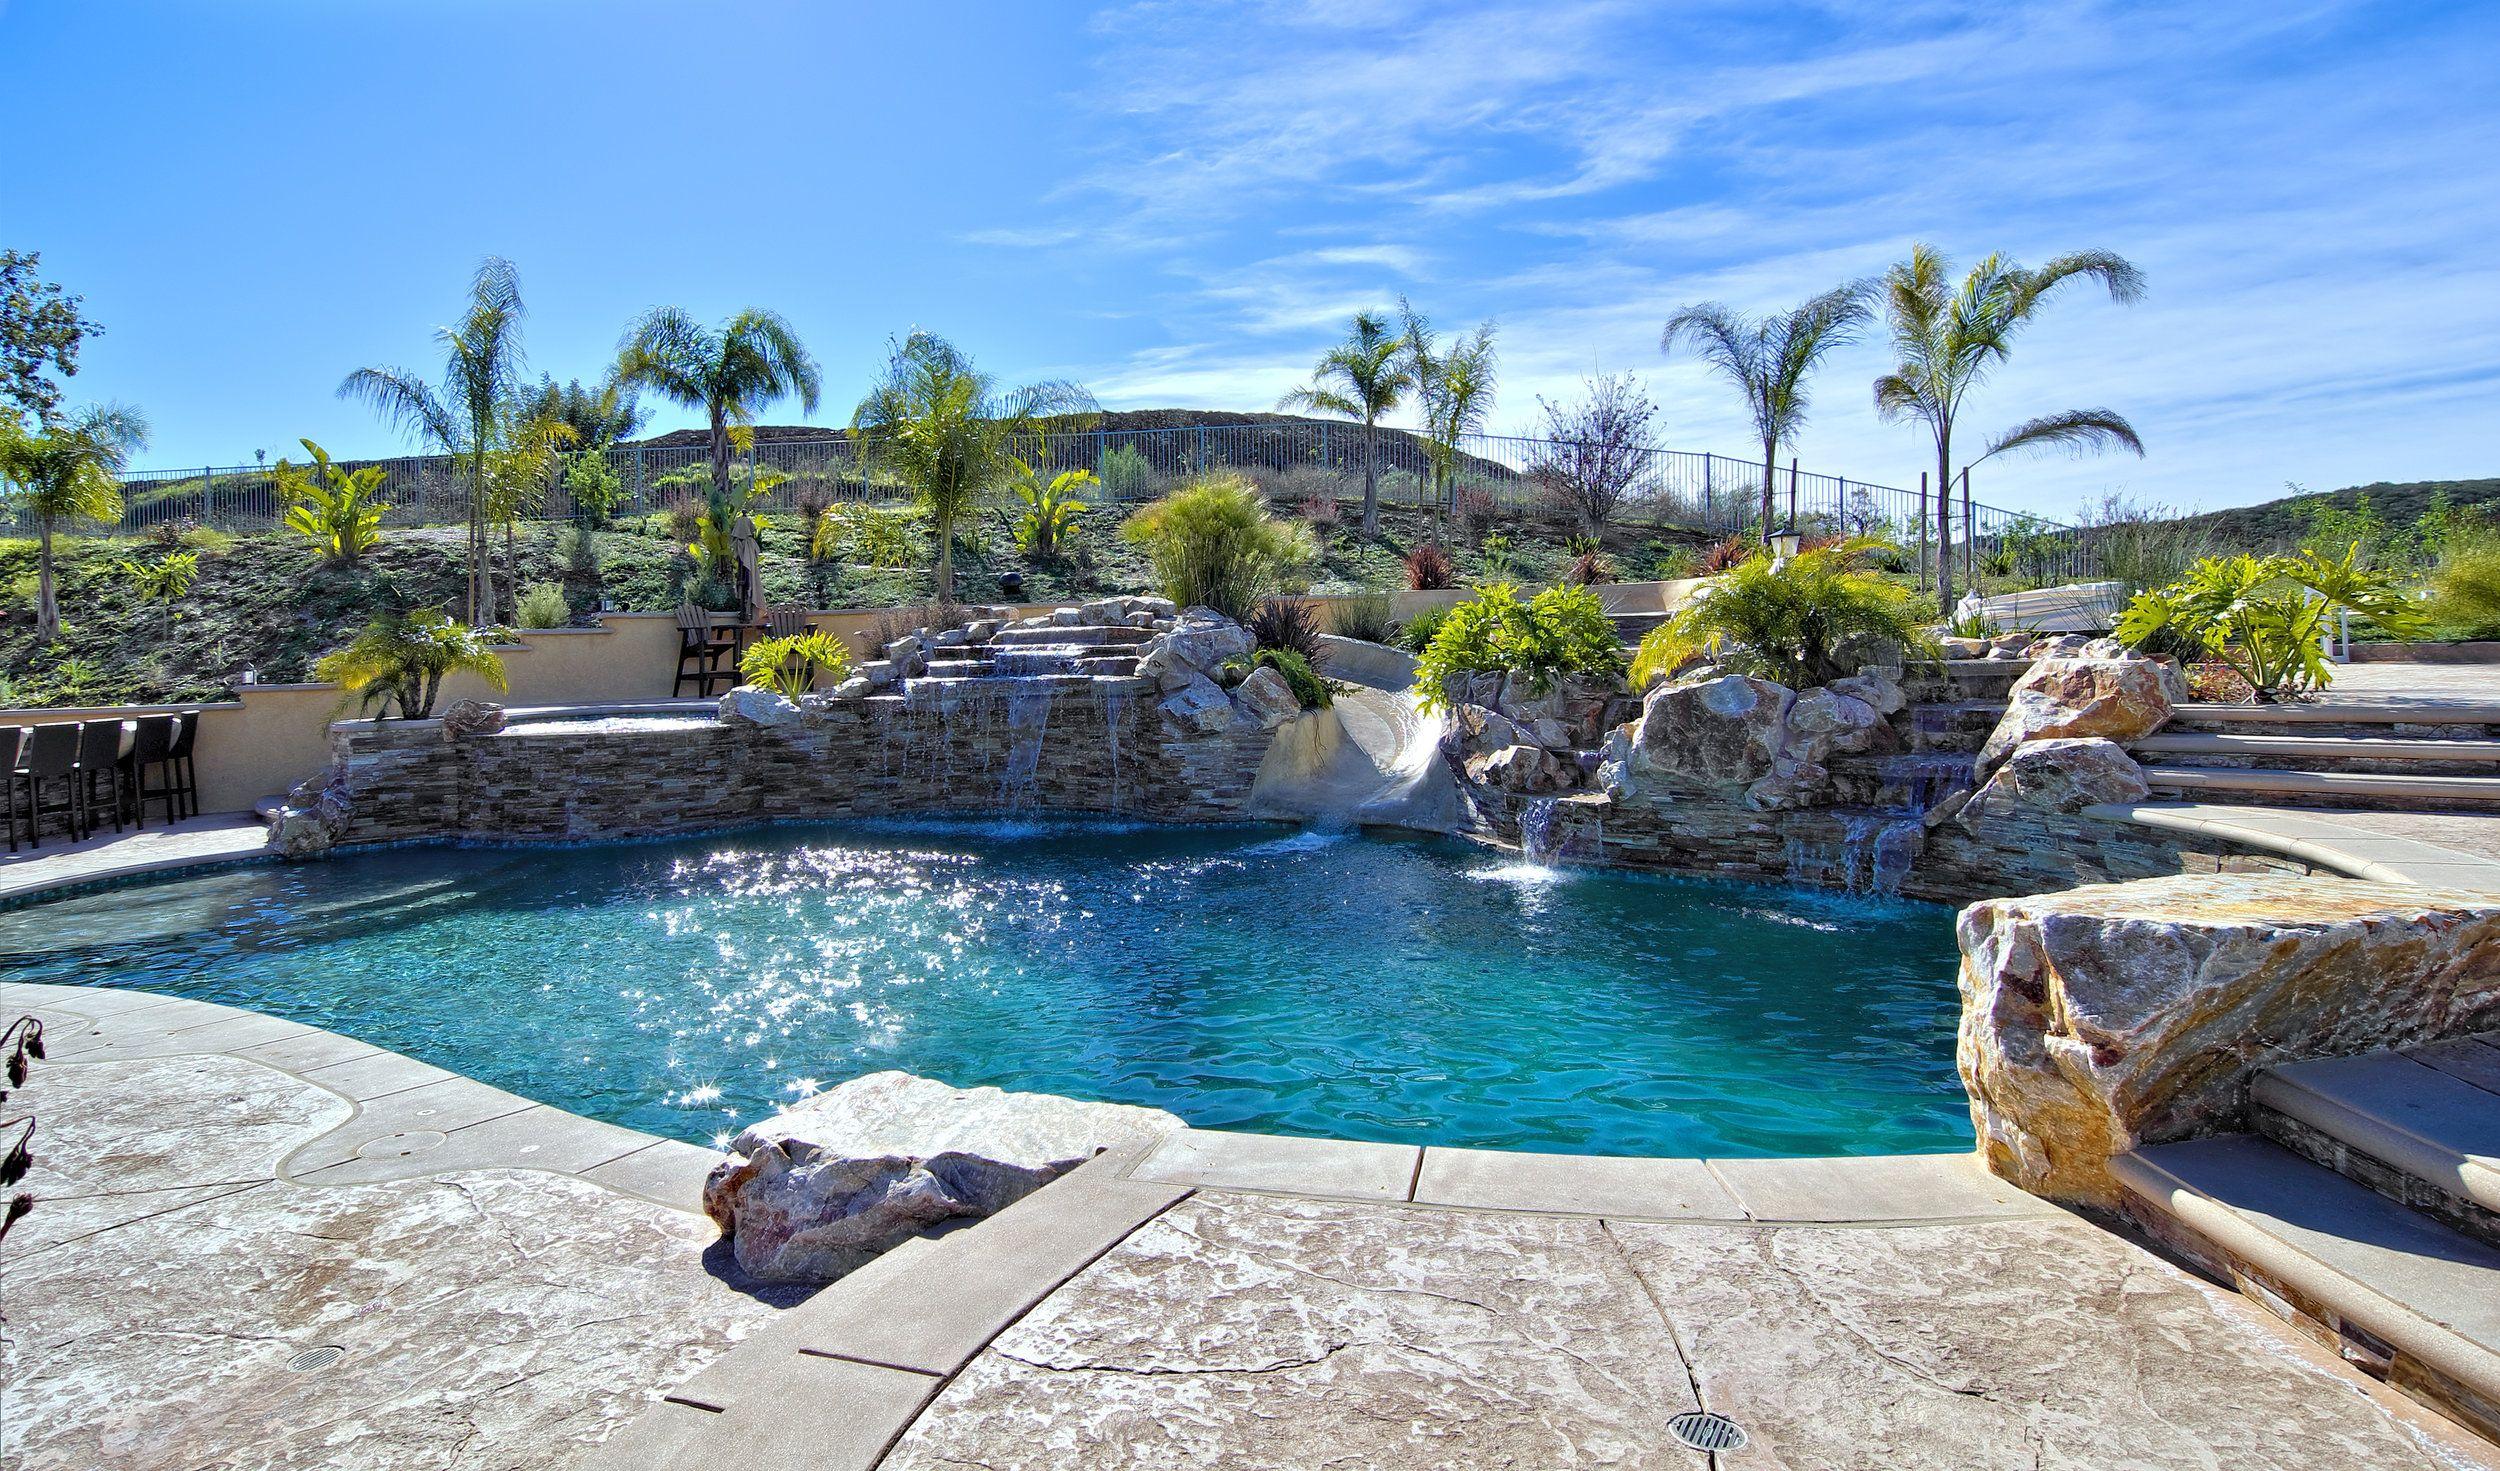 California Pools Thousand Oaks,CA info@californiapools.com  800-282-7665 | California pools, Pool, Backyard pool